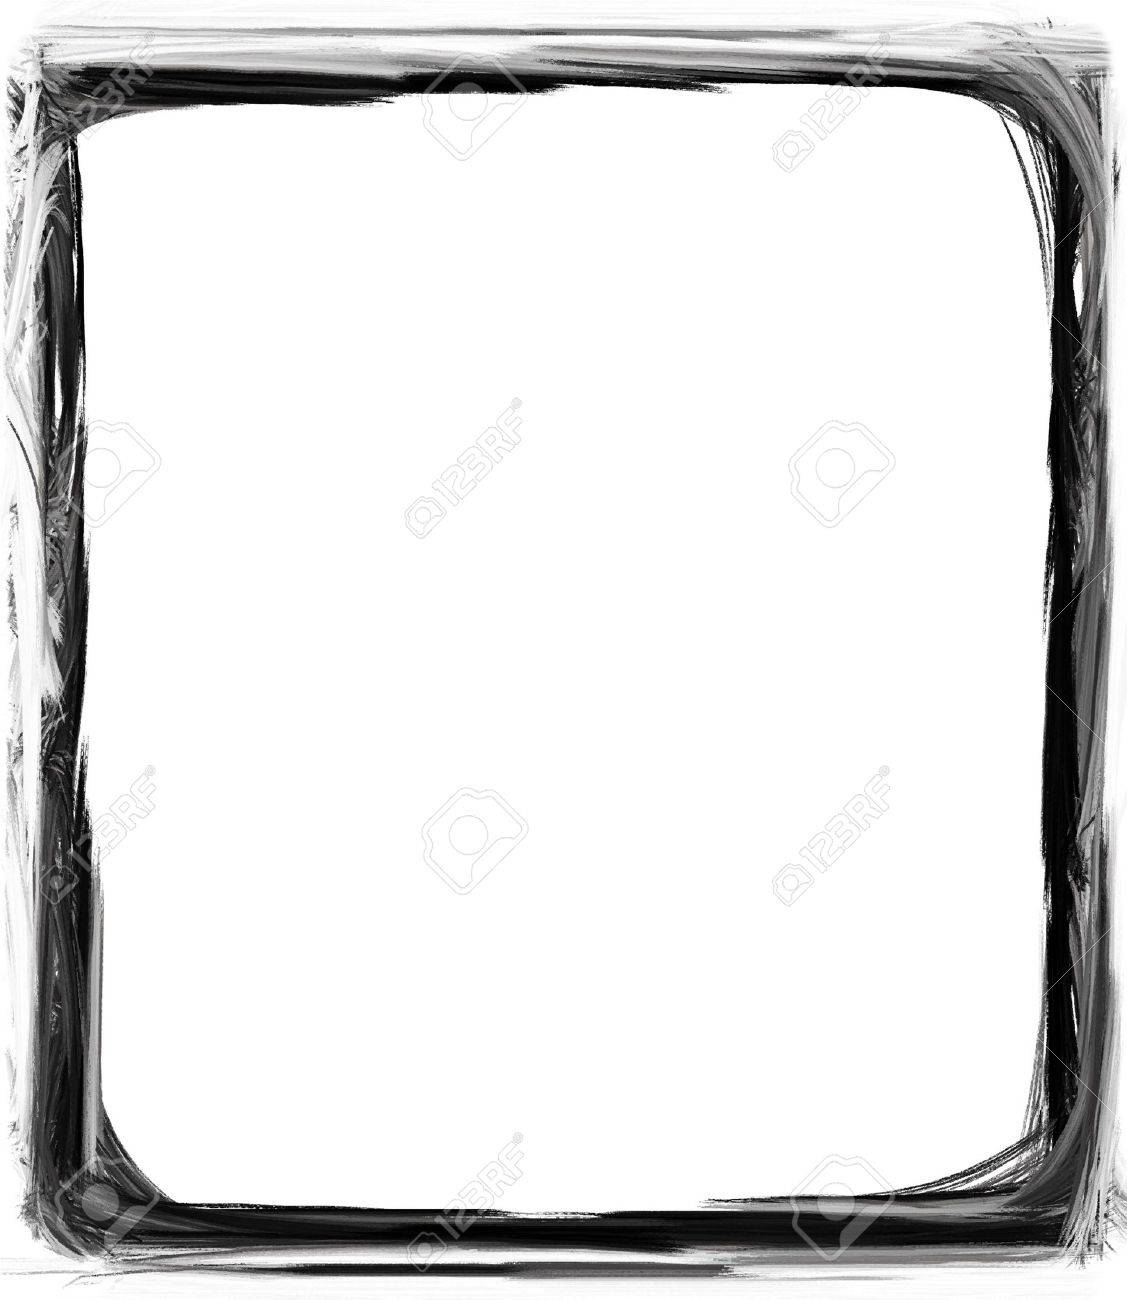 Computer designed grunge border or frame Stock Photo - 17517538